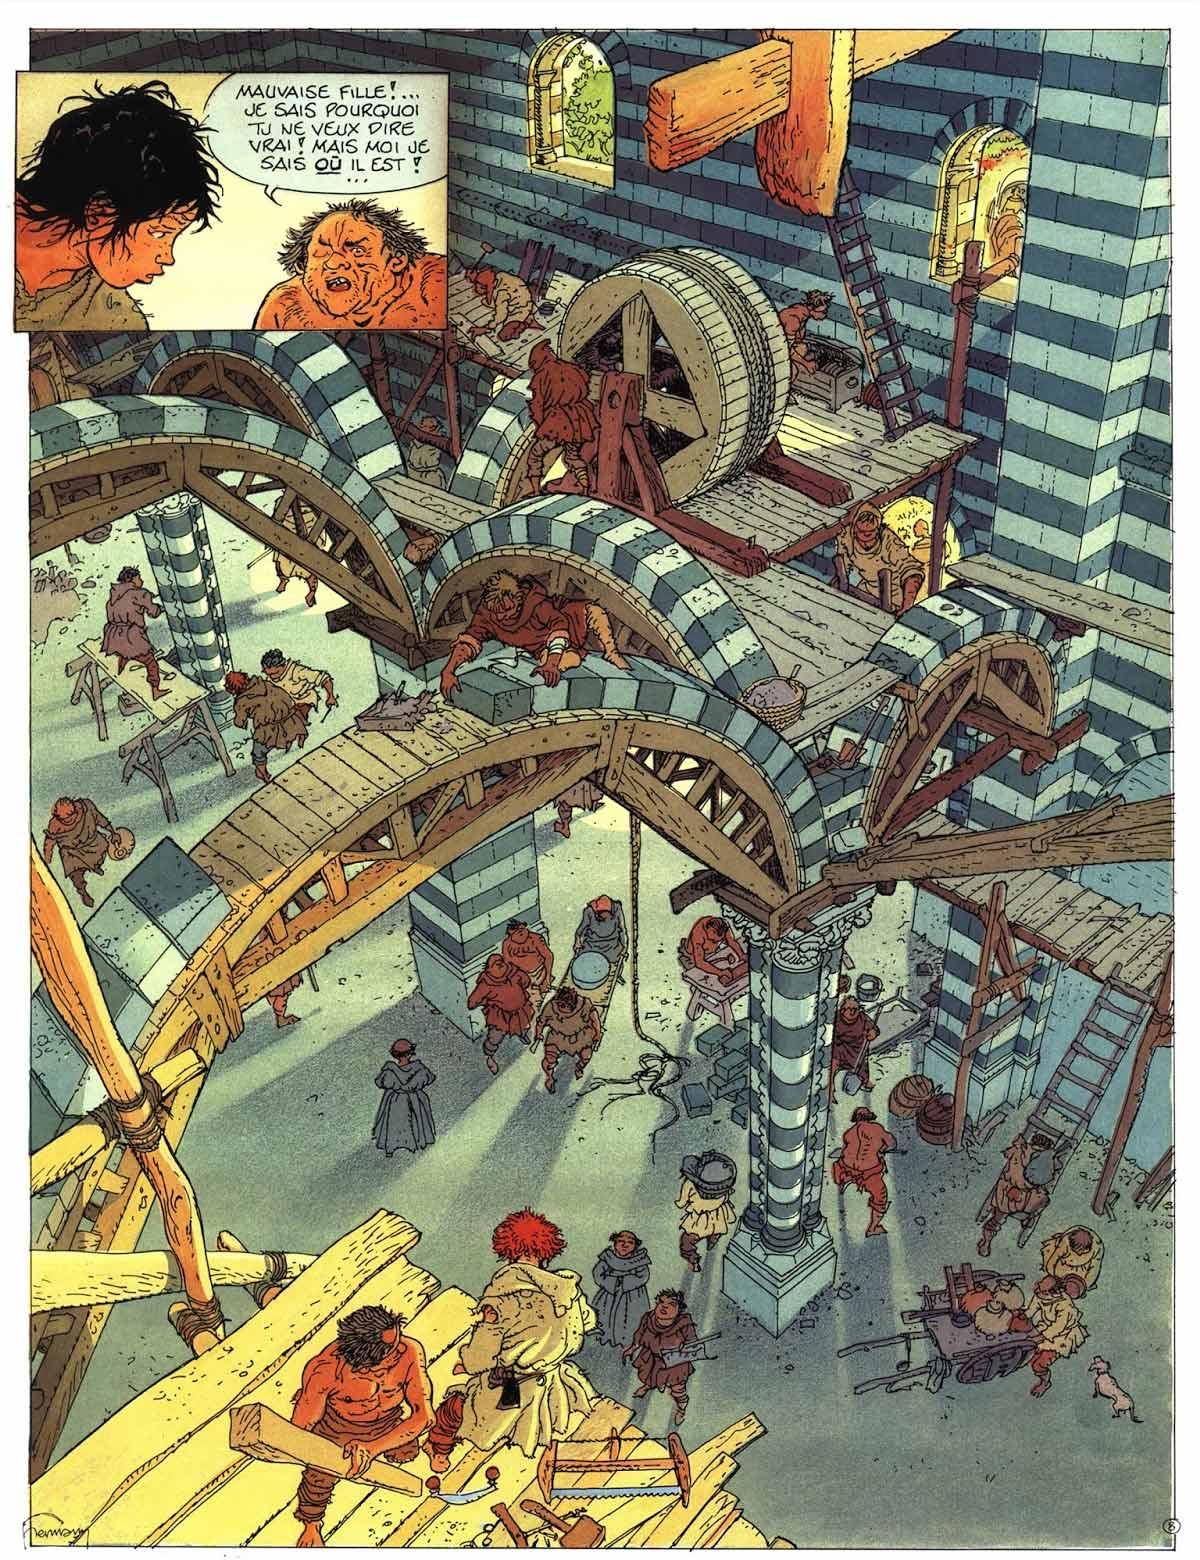 Golem-Comics-resena-las-torres-de-bois-mauri-maury-hermann-03